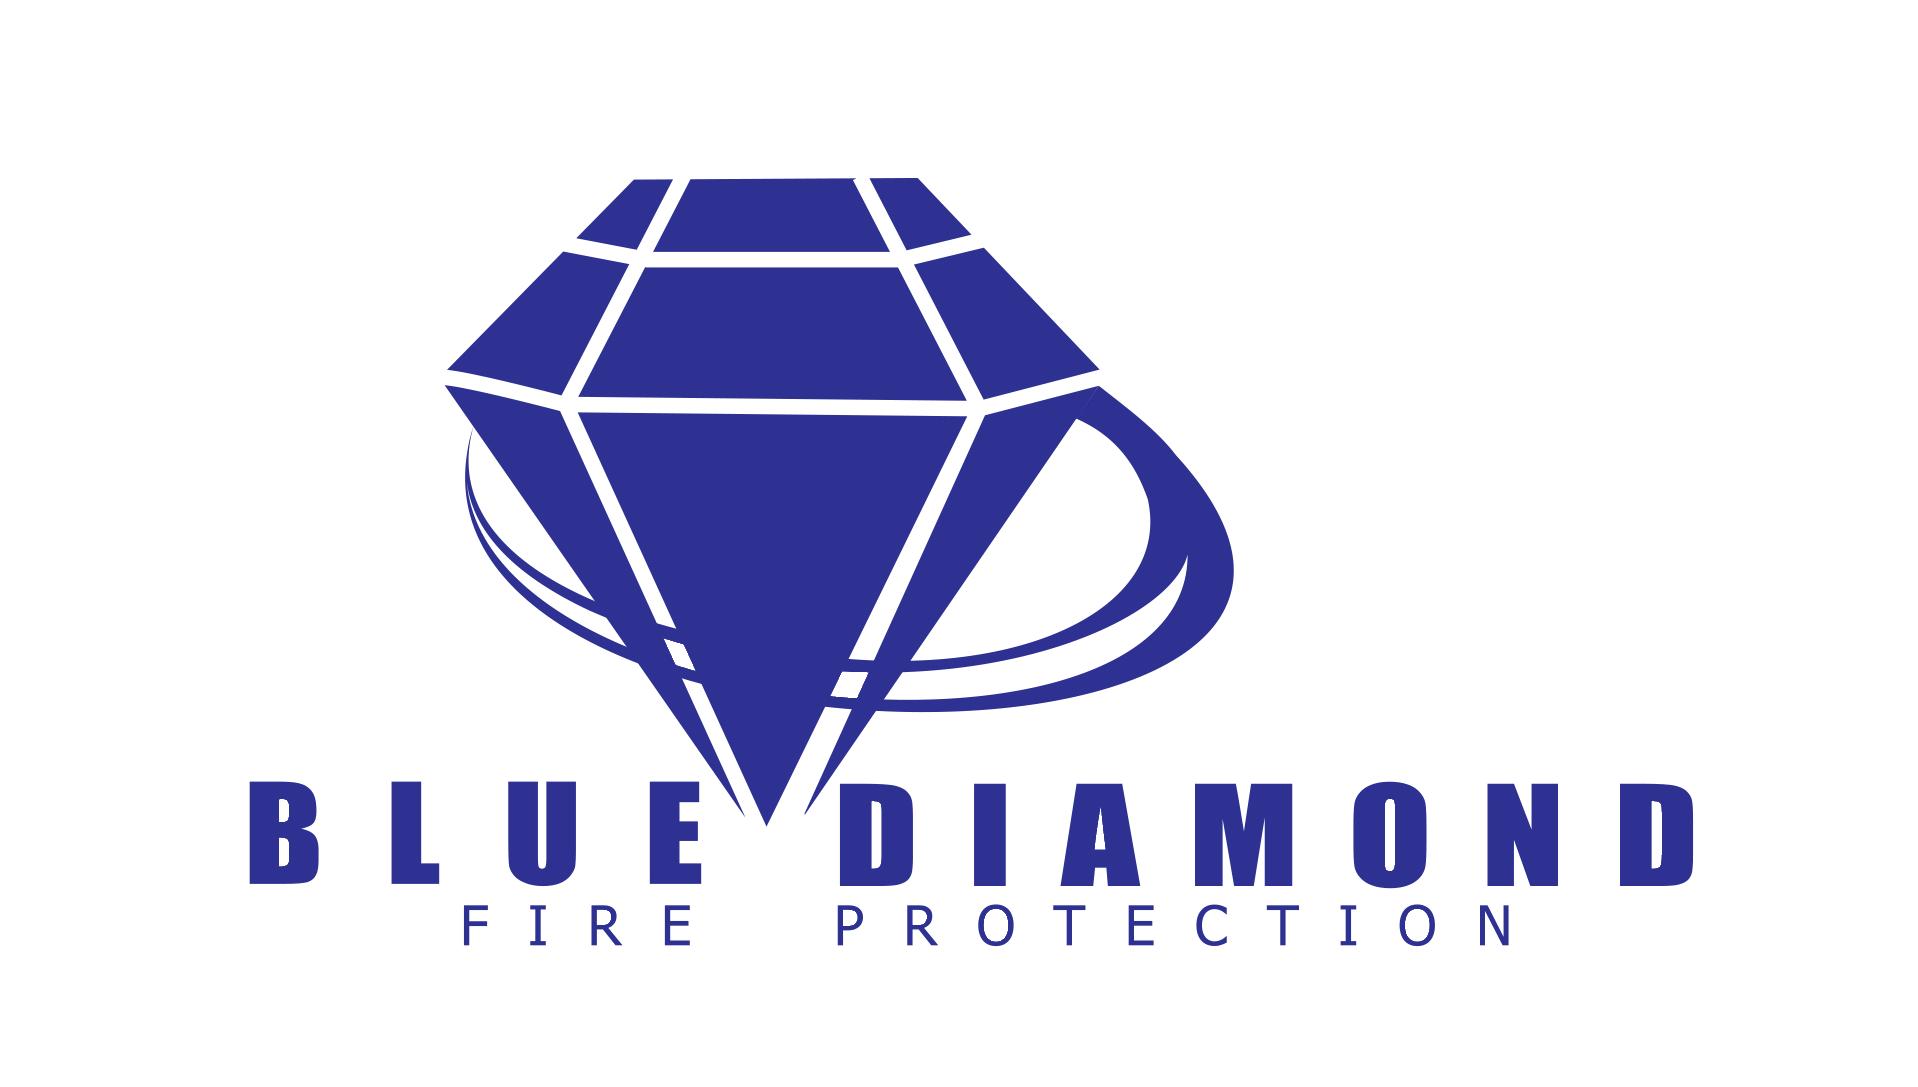 Blue Diamond Fire Protection